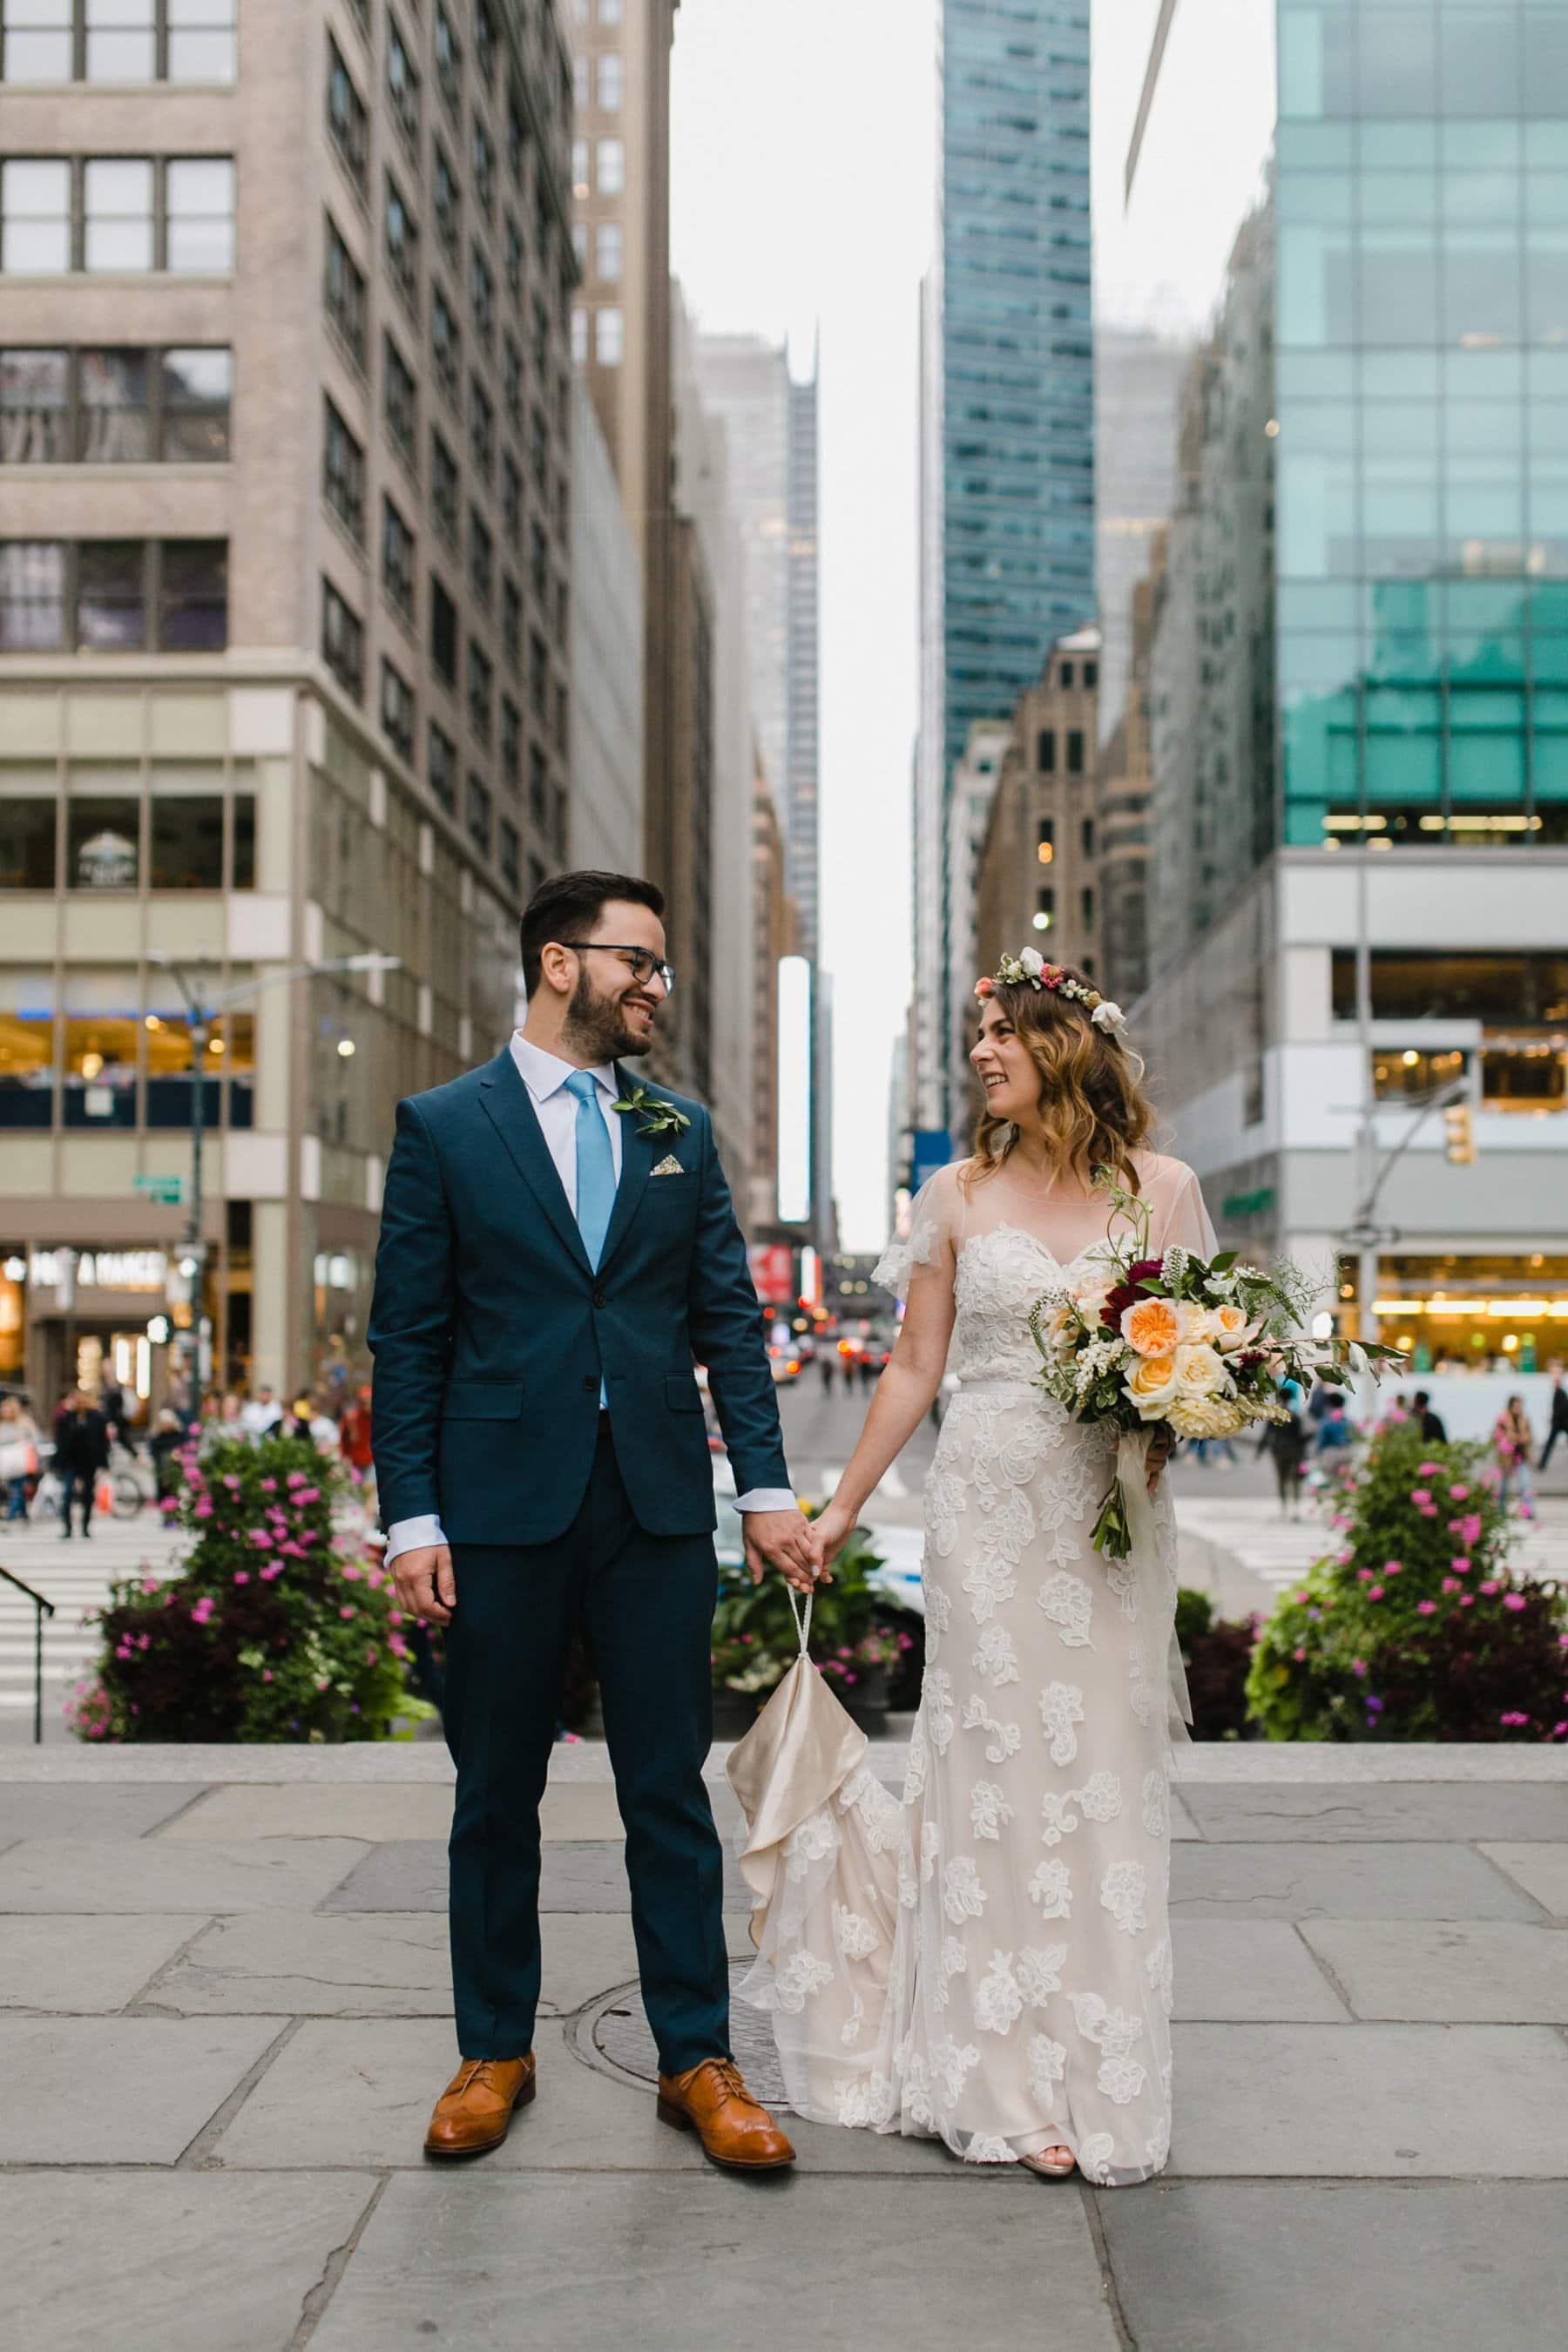 New York City Manhattan wedding boho bride & groom